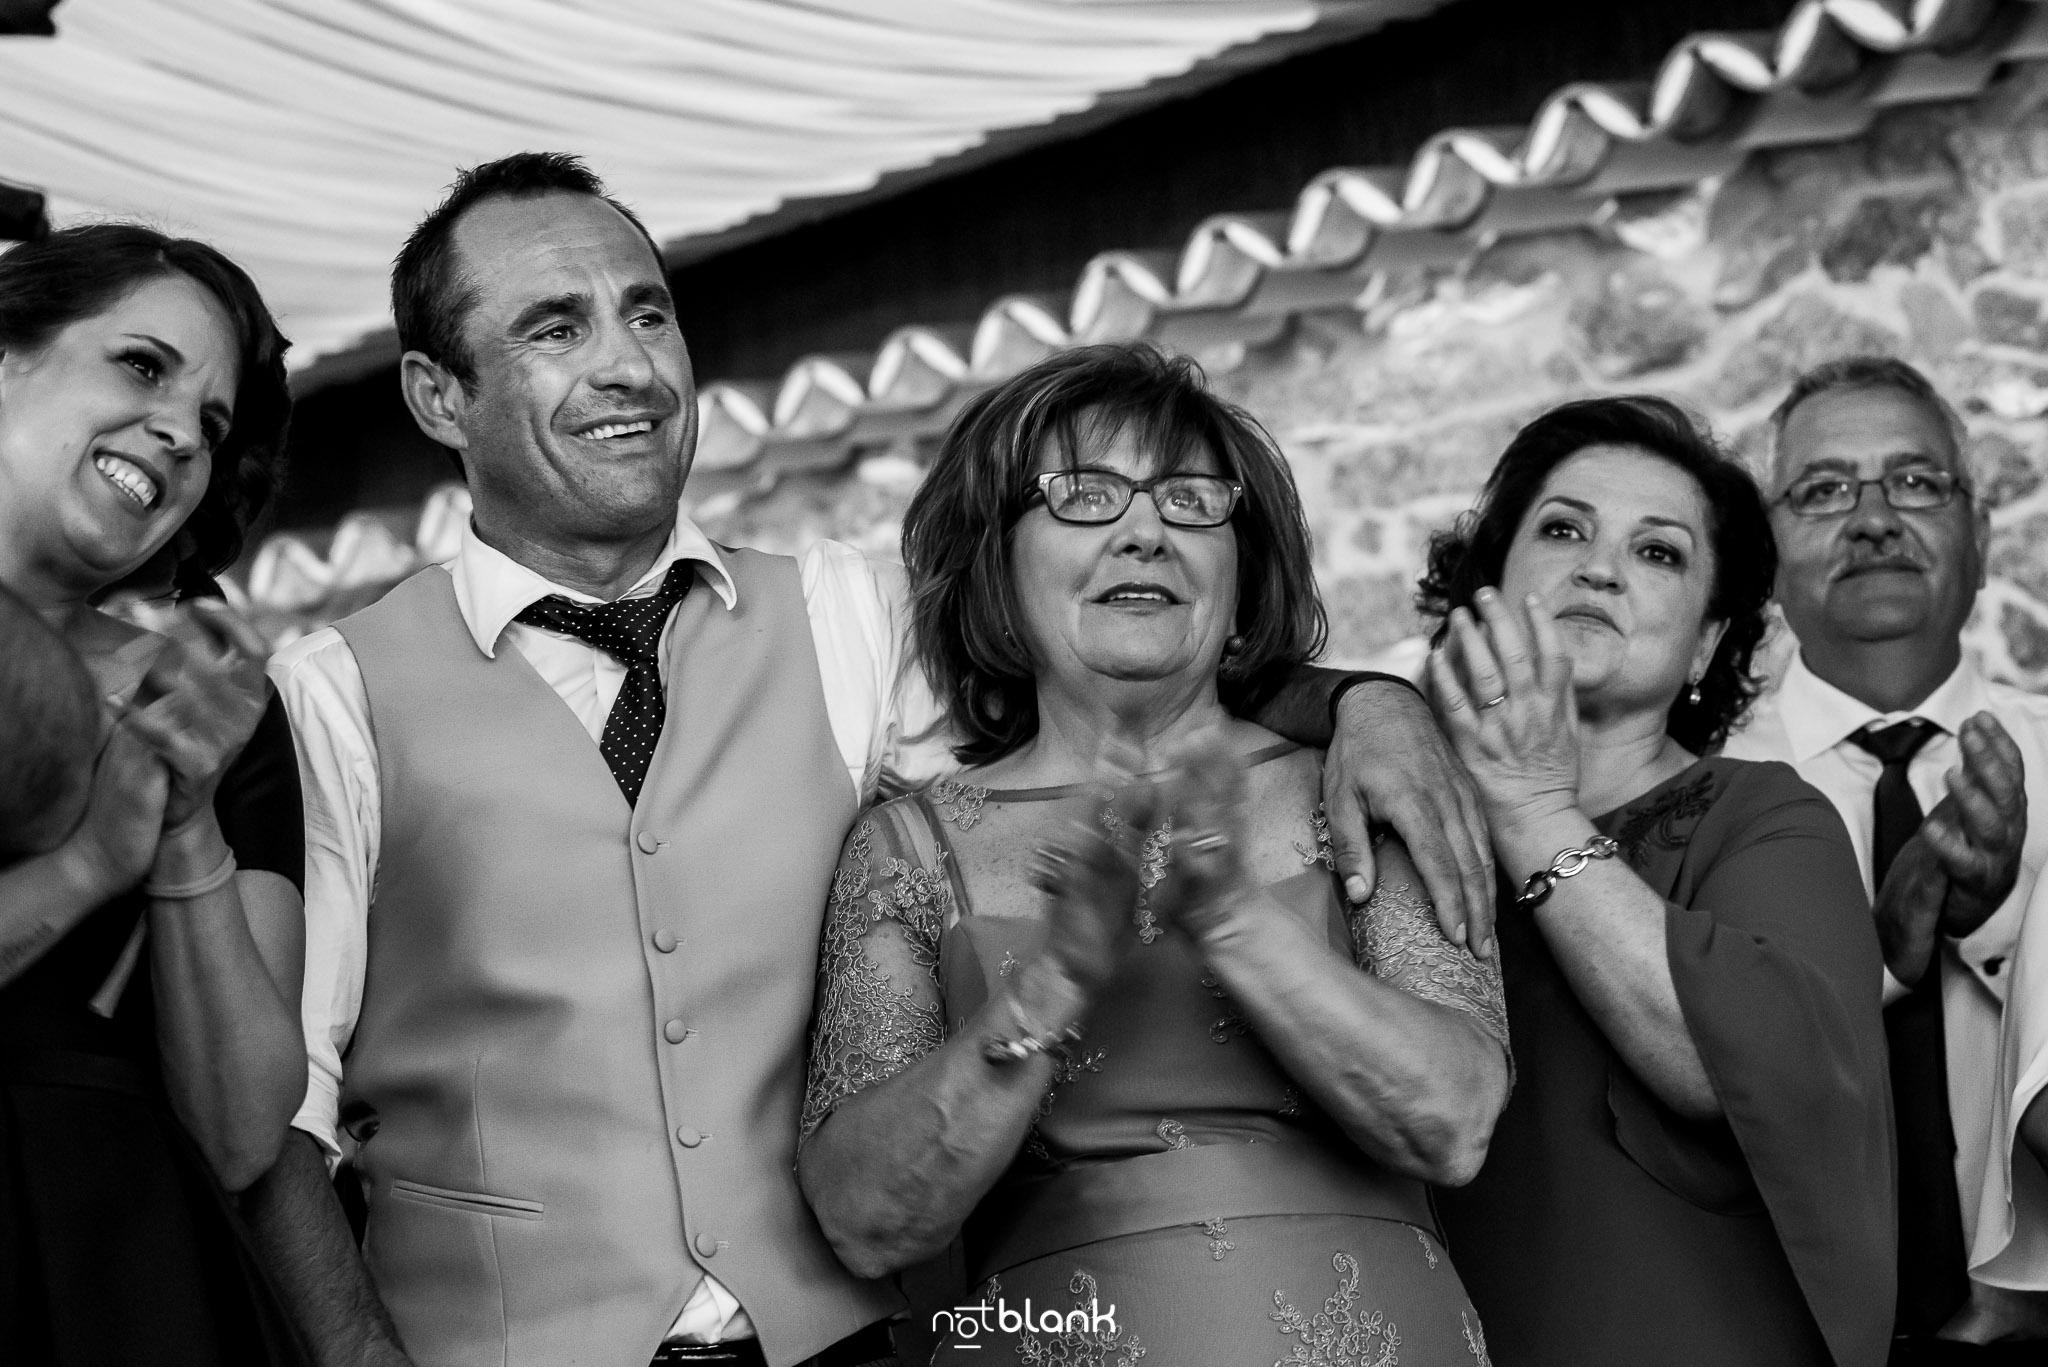 Fotos boda pazo moreira ponteareas-Postboda-Fotografos-de-Boda-Vigo-Tui-Pontevedra-Baixo-Miño-Portugal-Orense-La Guardia-Ponteareas